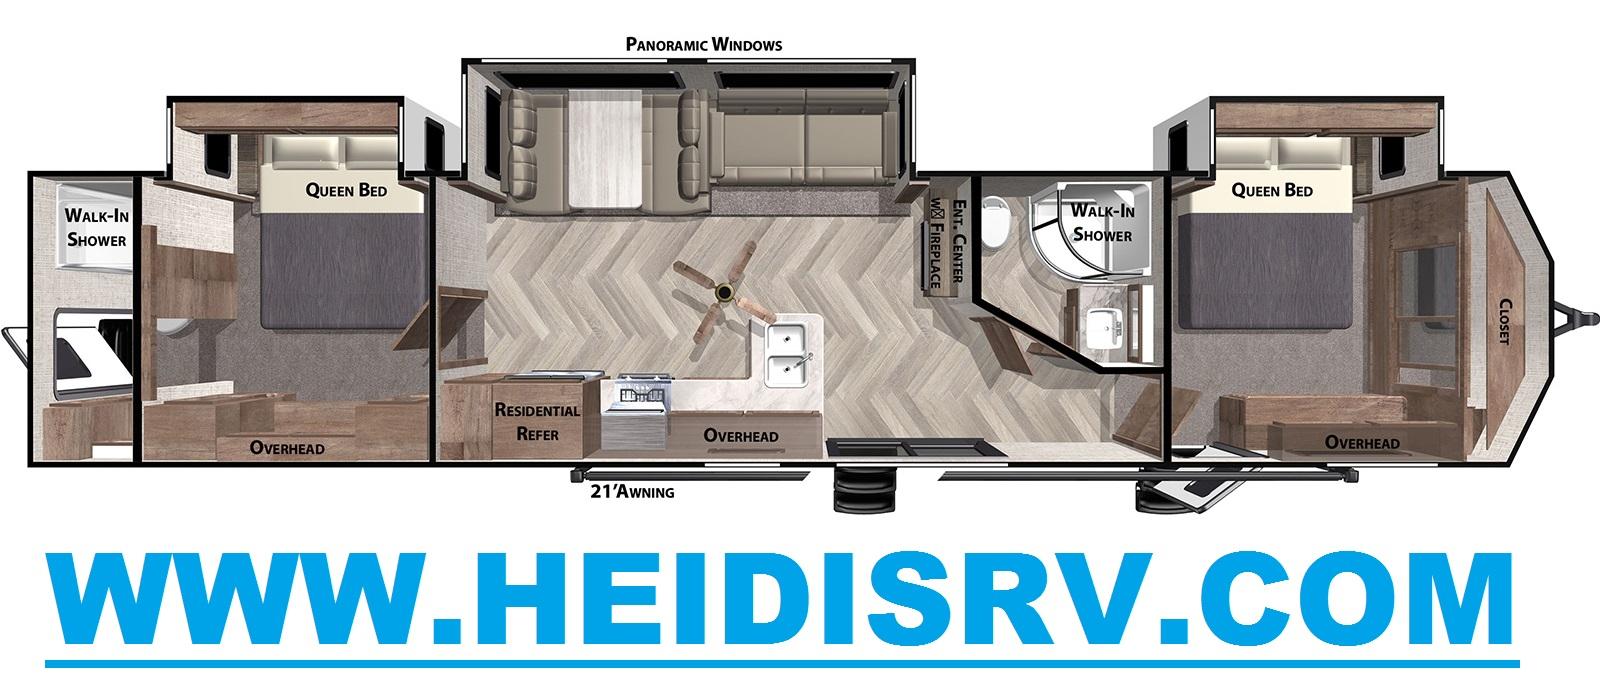 2 Queen Beds Inventory Heidi S Rv Centre